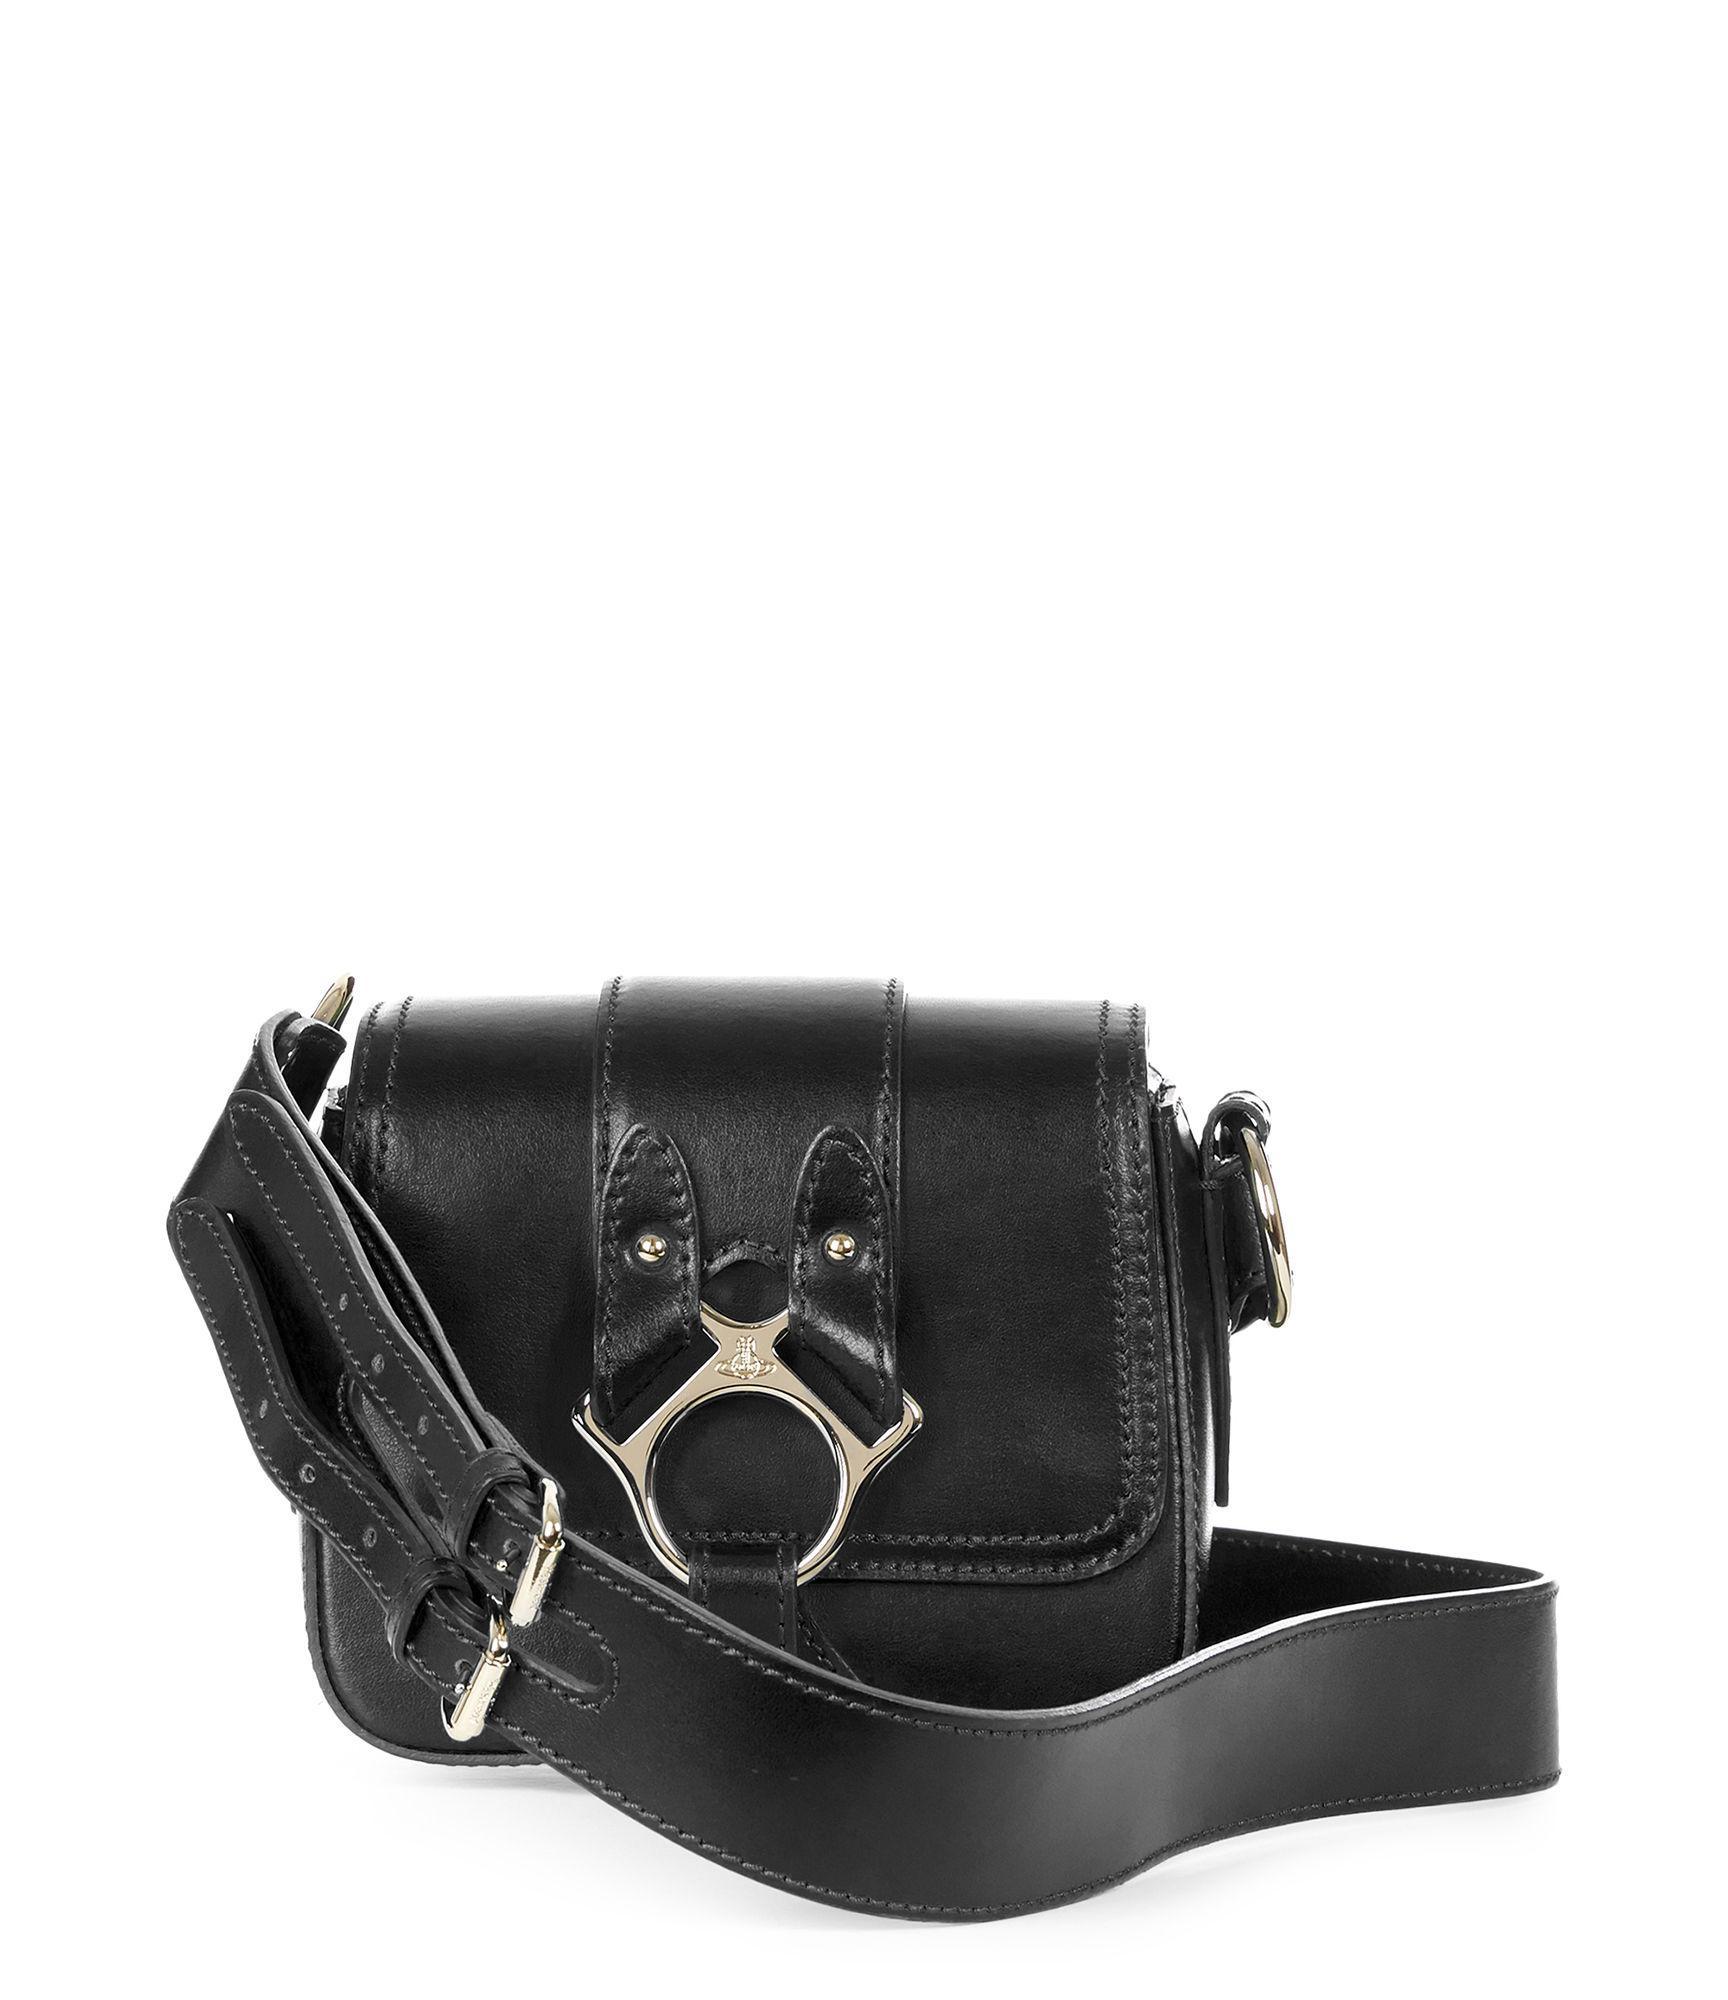 f43231f236 Vivienne Westwood Small Folly Saddle Bag 43030021 Black